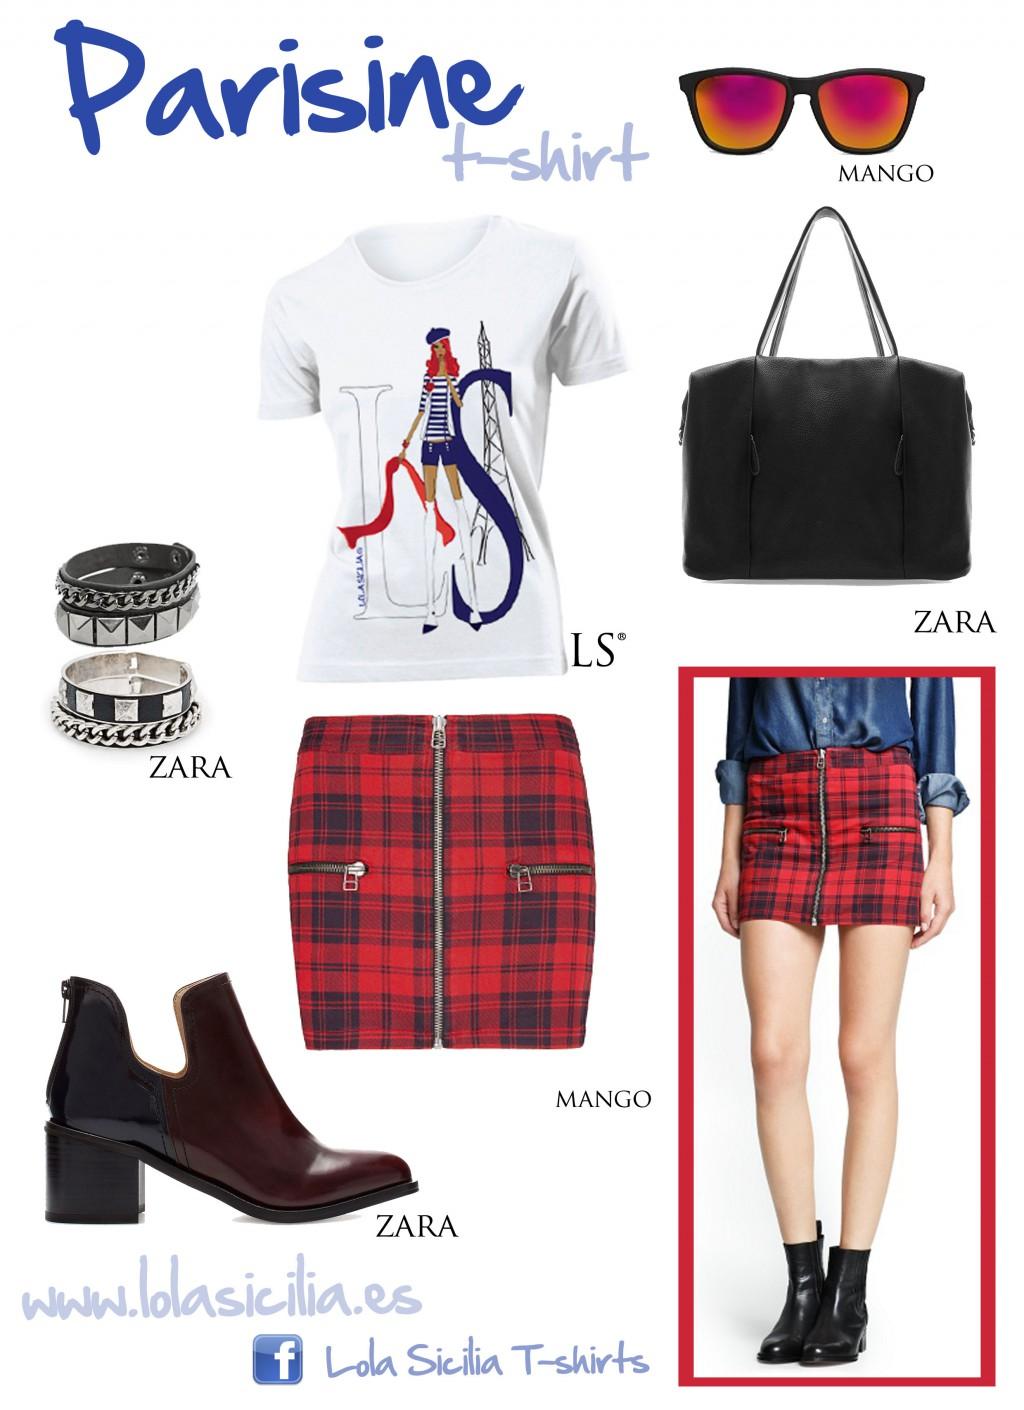 Look of the week: Falda Tartan + Parisine T-shirt-370-lolasicilia